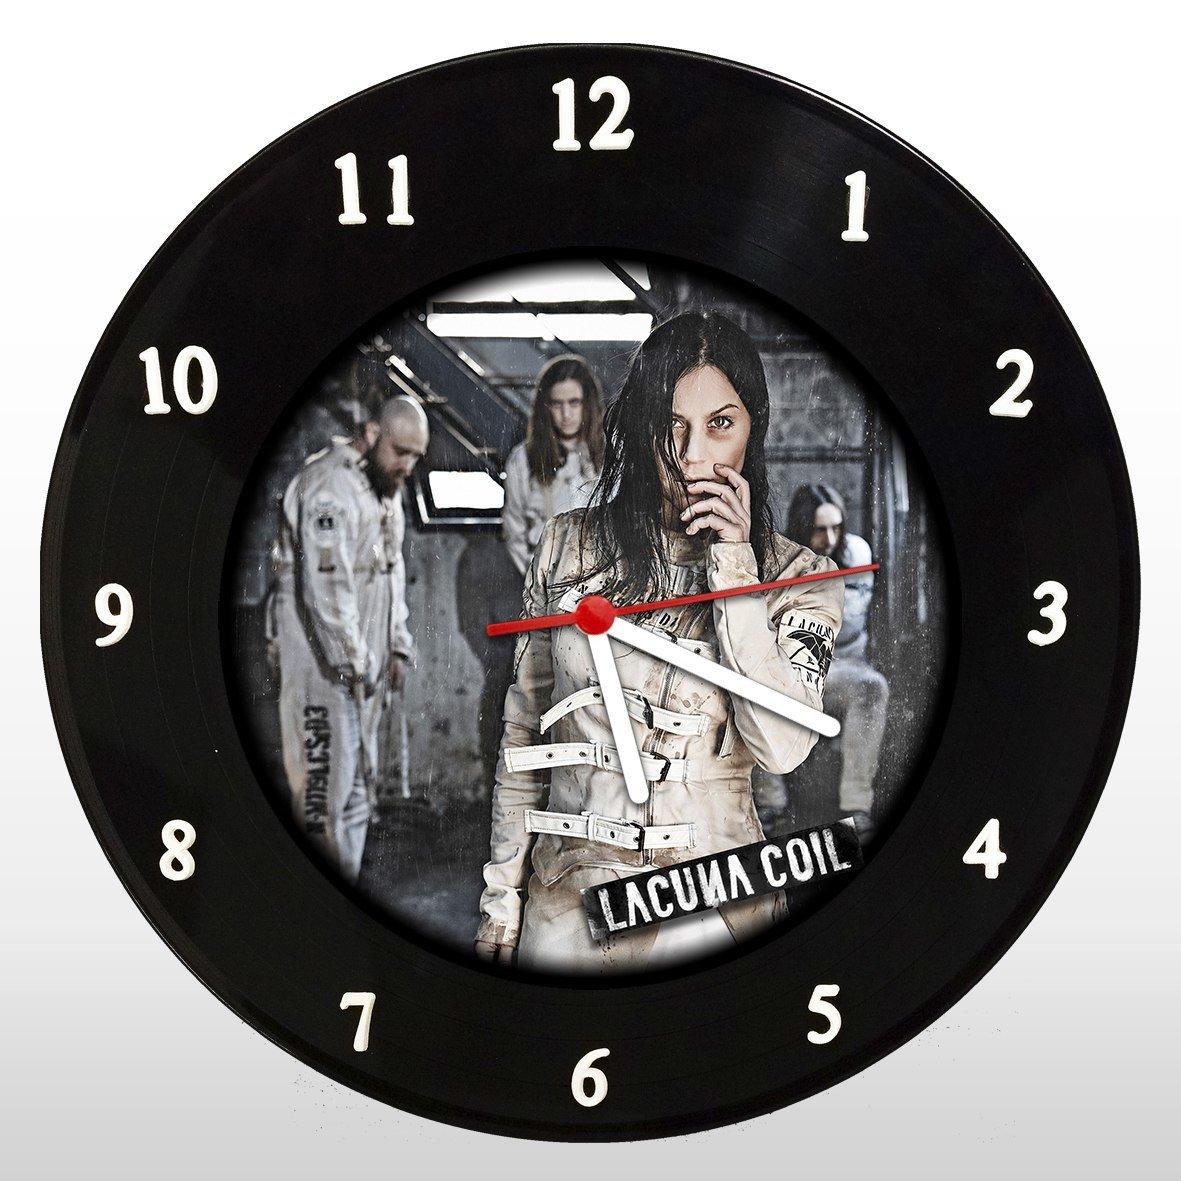 Lacuna Coil - Relógio de Parede em Disco de Vinil - Mr. Rock